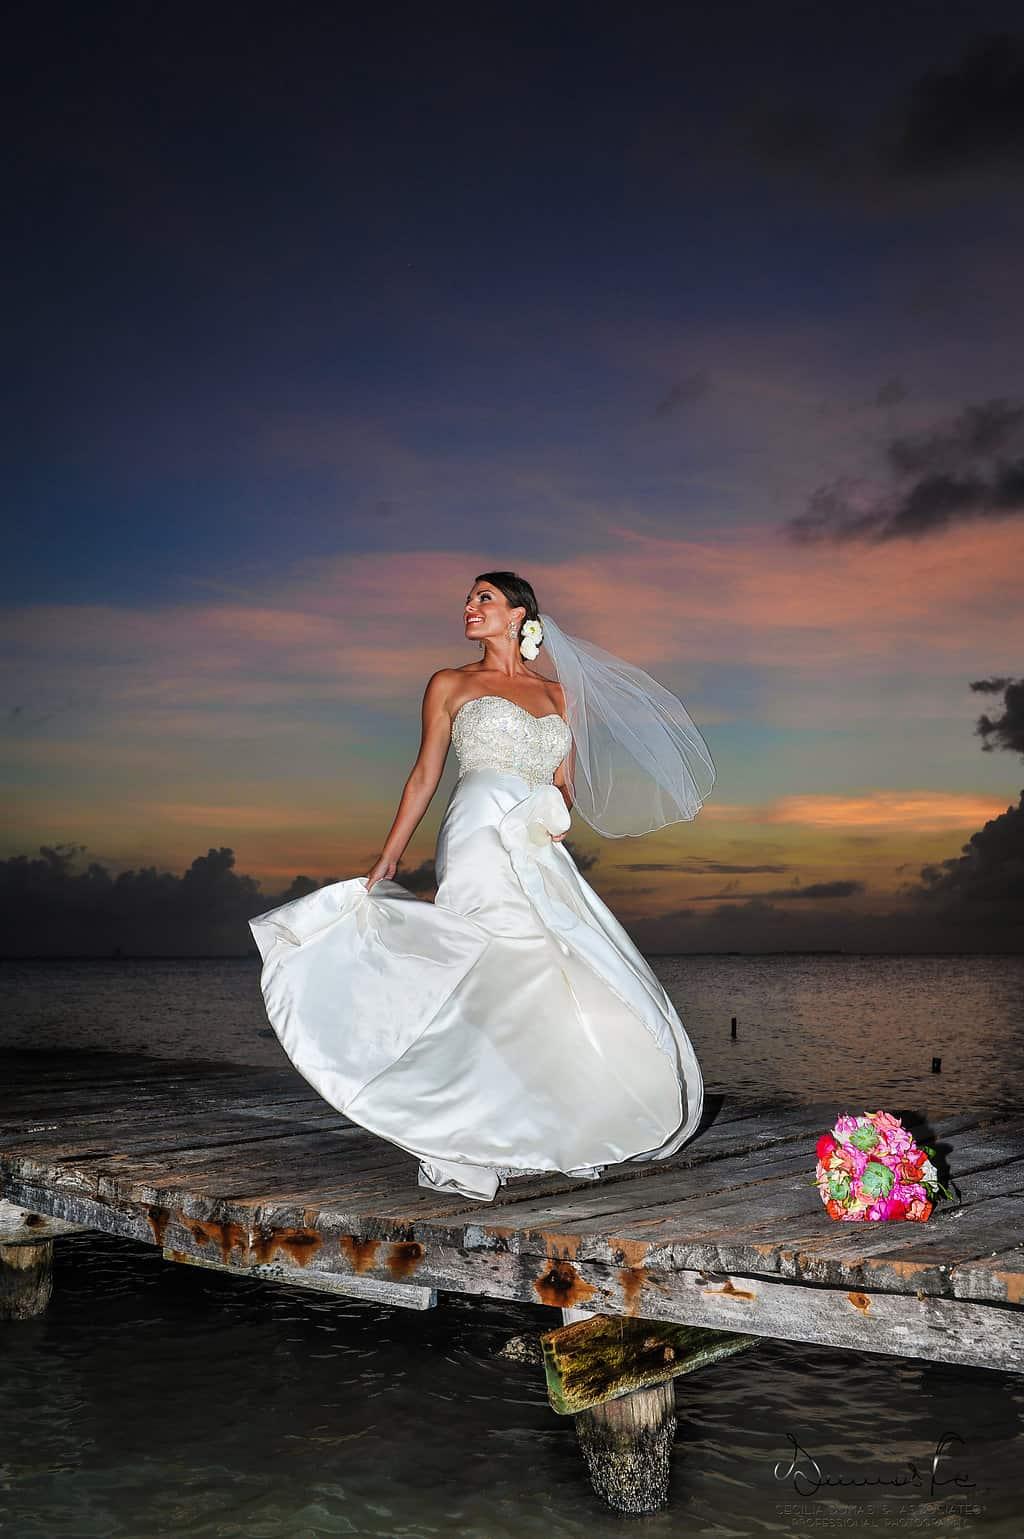 islamujeres-zama-weddingphotography-lindseysalvatore85